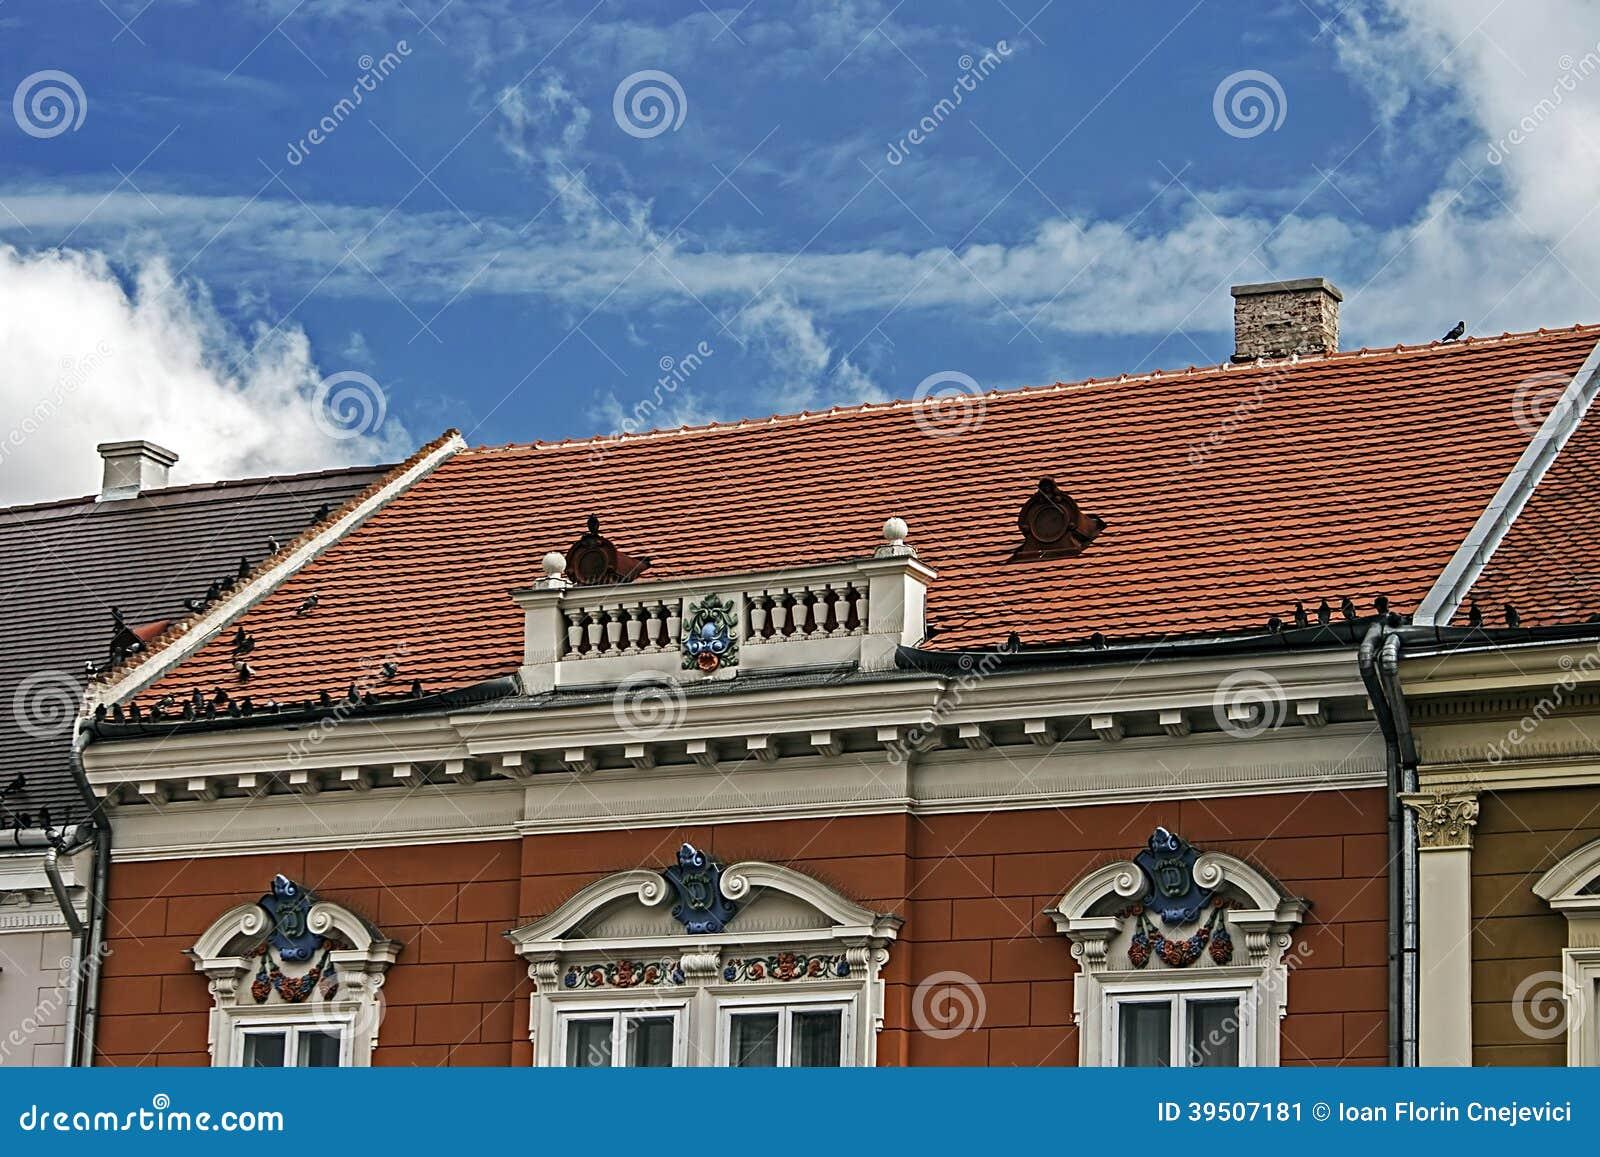 Architectural Detail 4